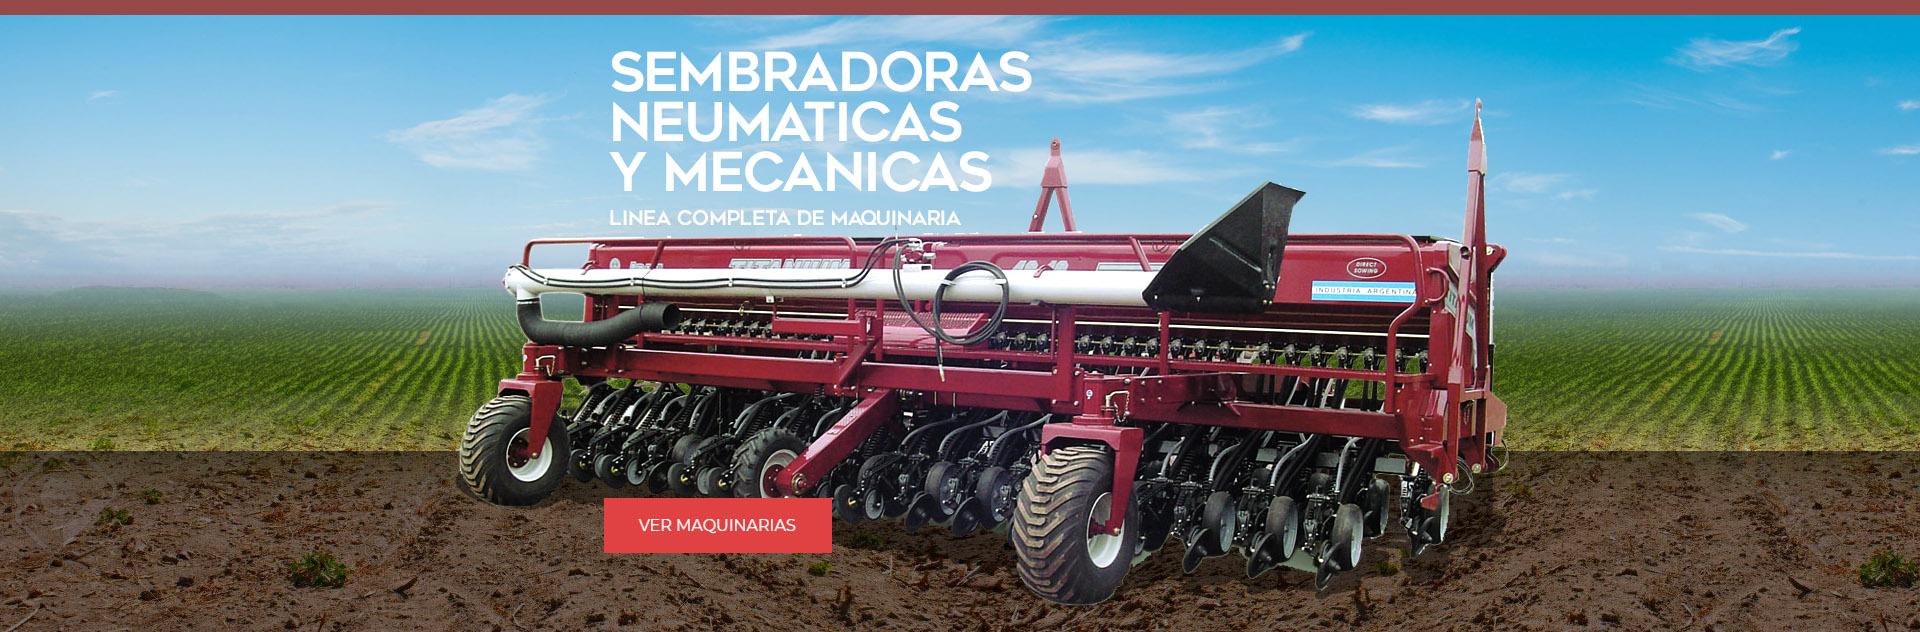 Sembradoras Neumaticas Mecanicas Abati Titanium Argentina Maquinaria Agricola